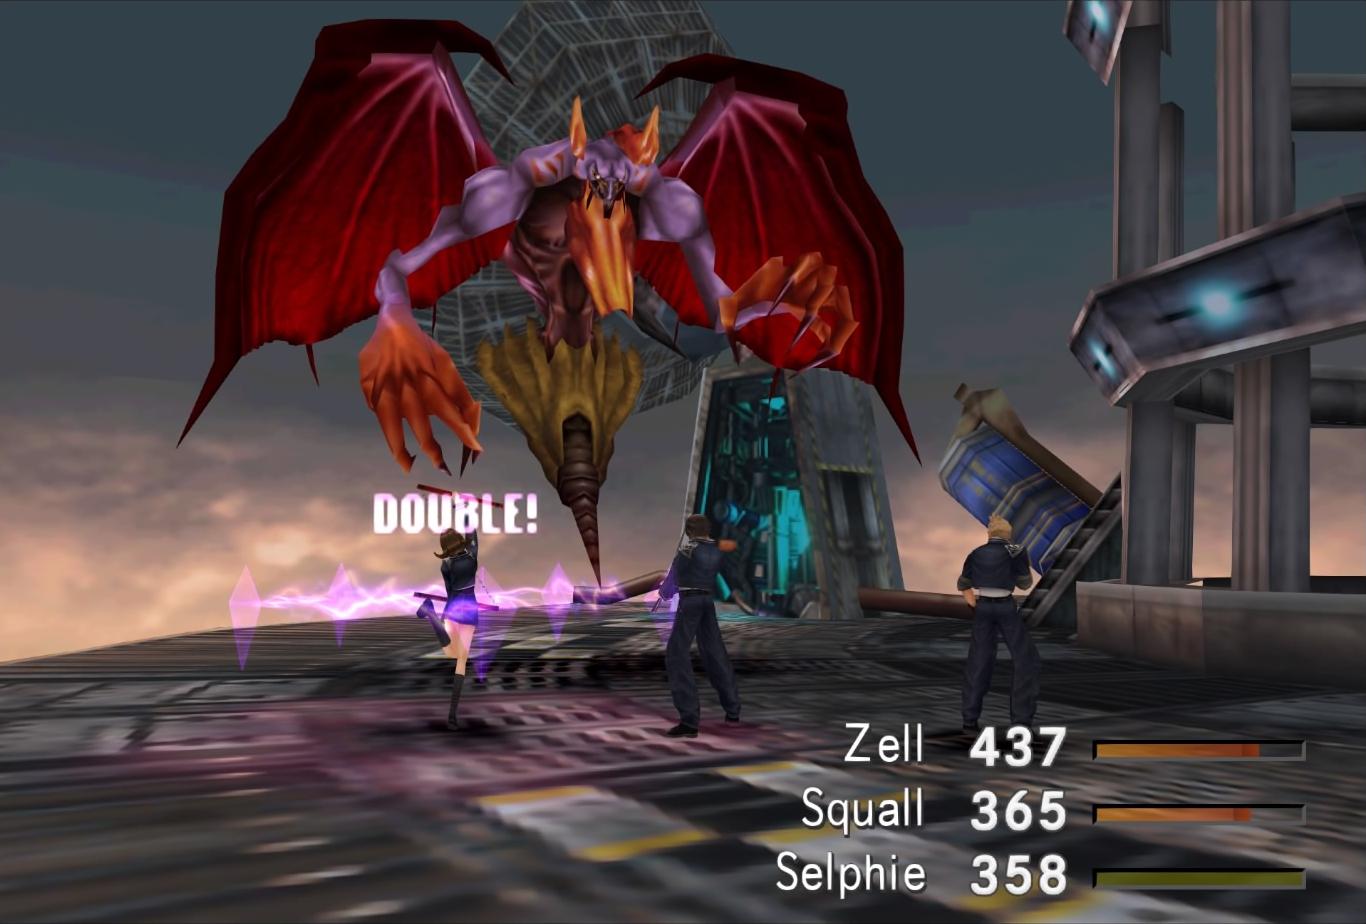 Double (Final Fantasy VIII)